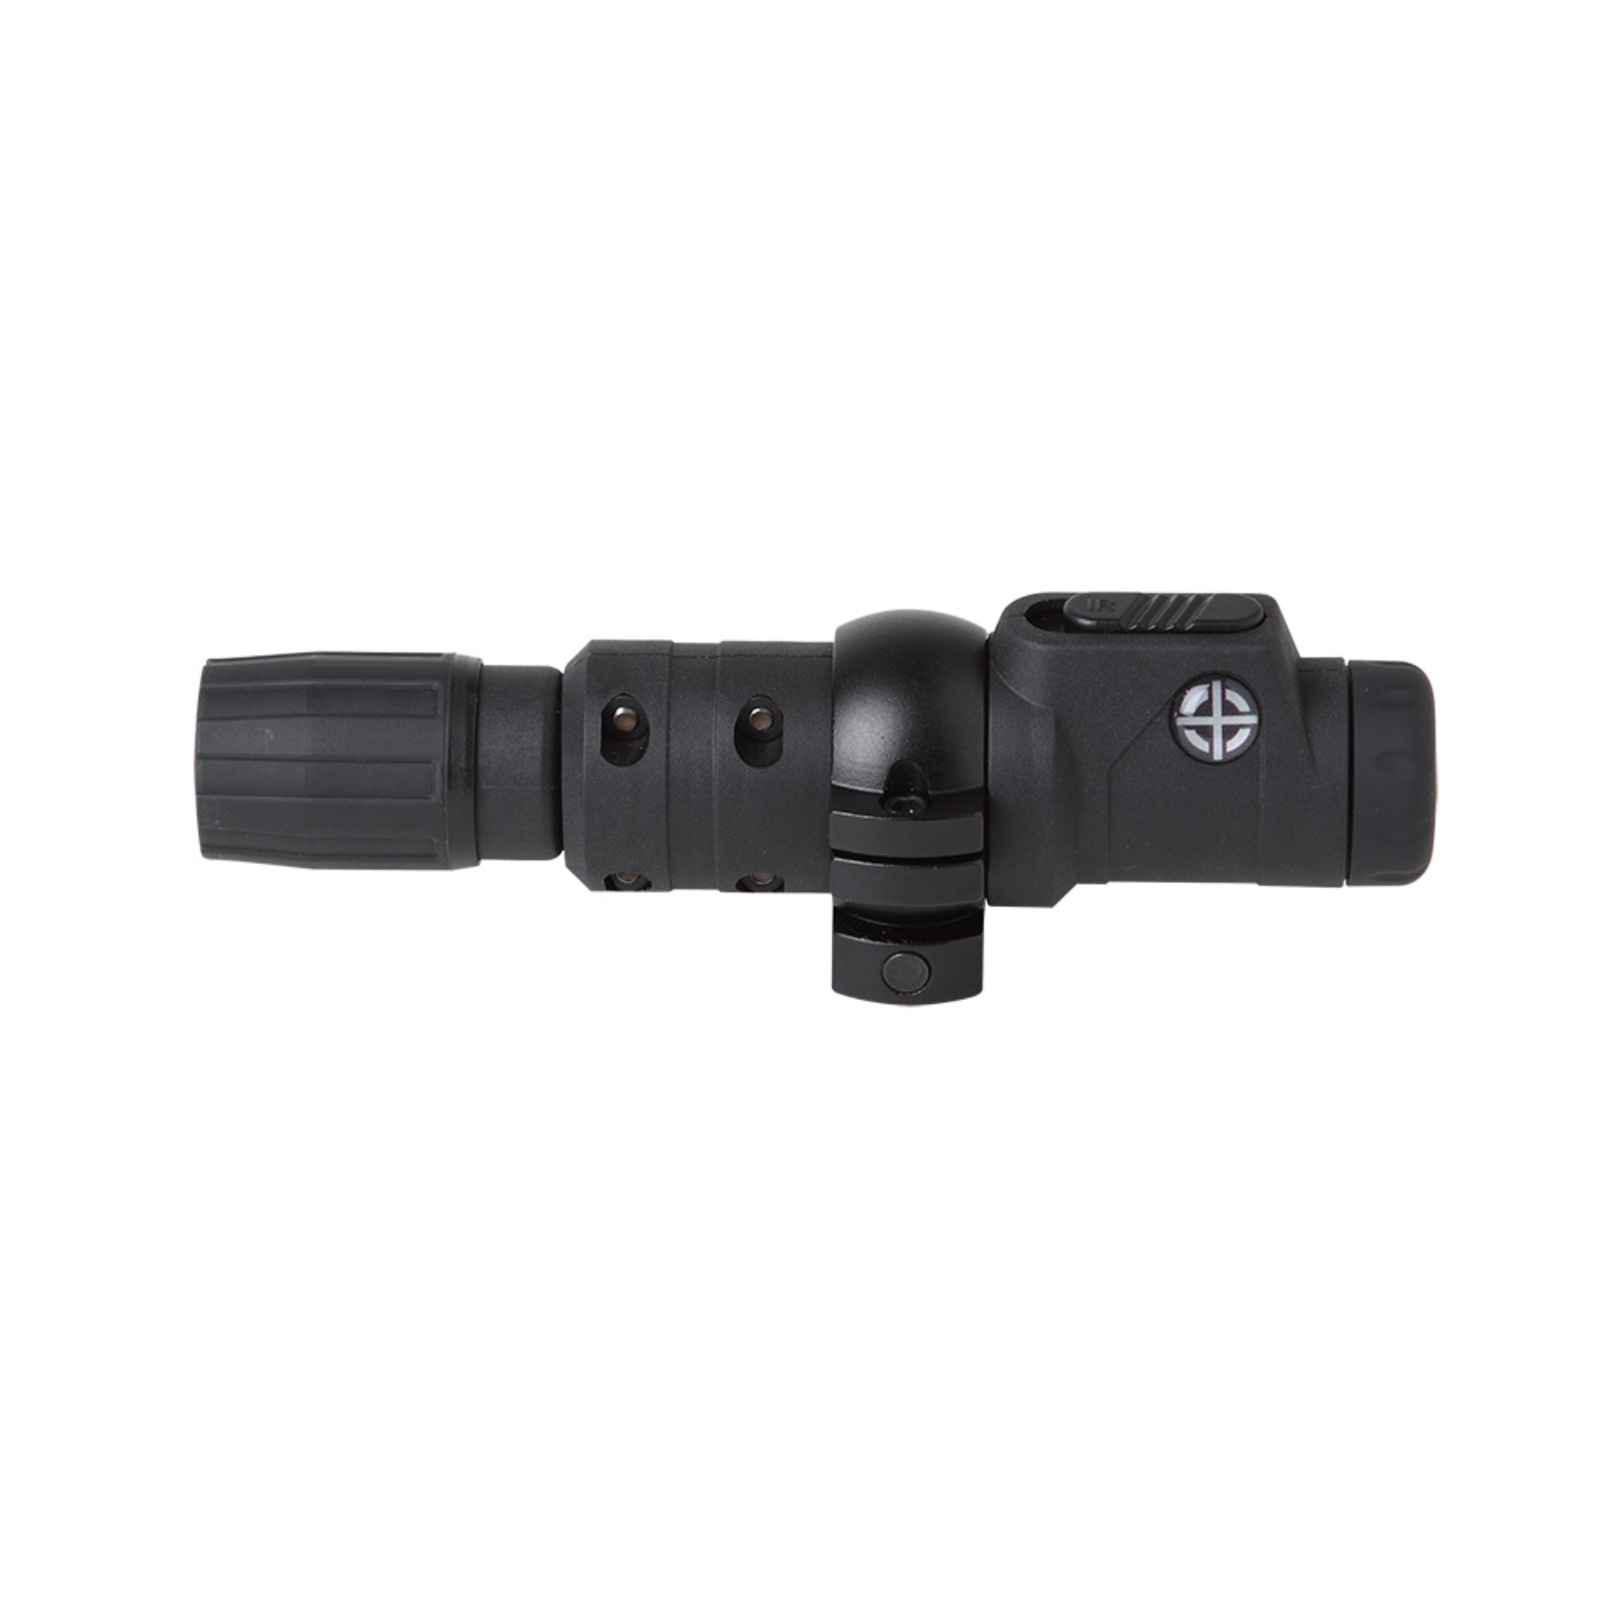 Sightmark IR-805 Compact Infrared Illuminator SM19075